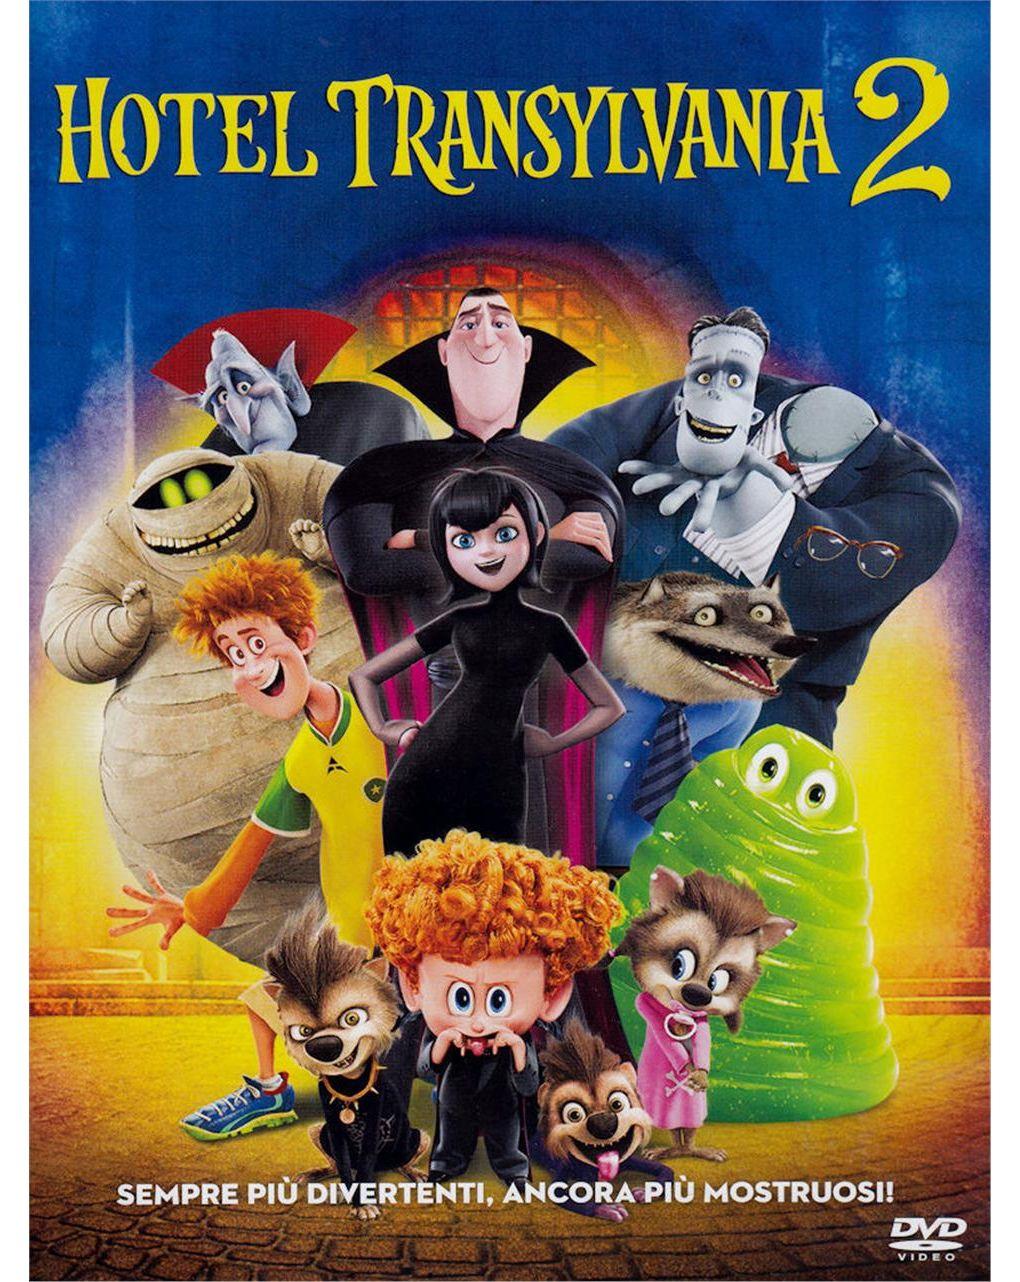 Dvd hotel transylvania 2 - Video Delta